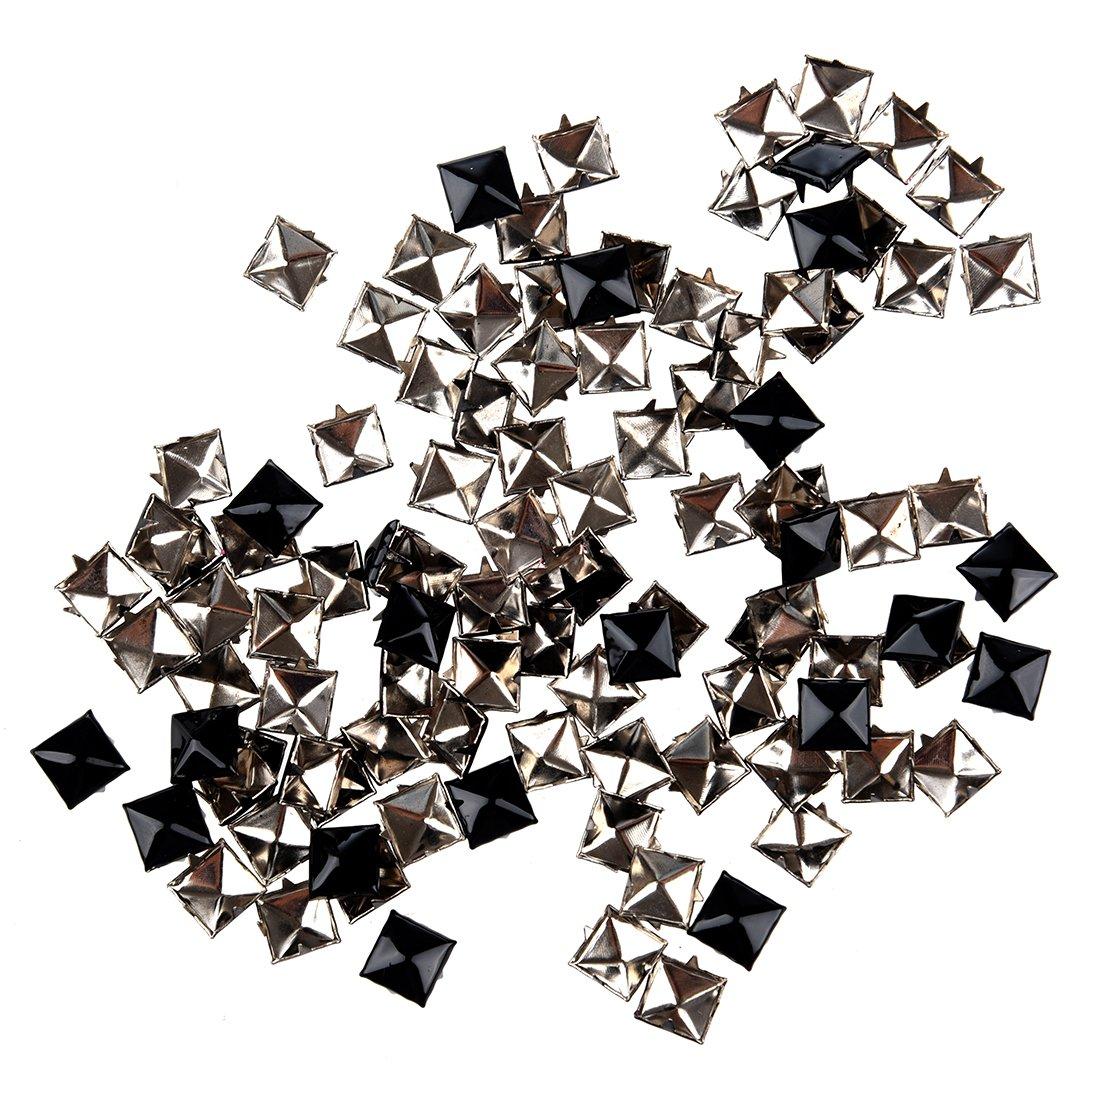 100pcs Pyramid Studs Spots Punk Spikes for DIY Craft Leathercraft Black SODIAL R